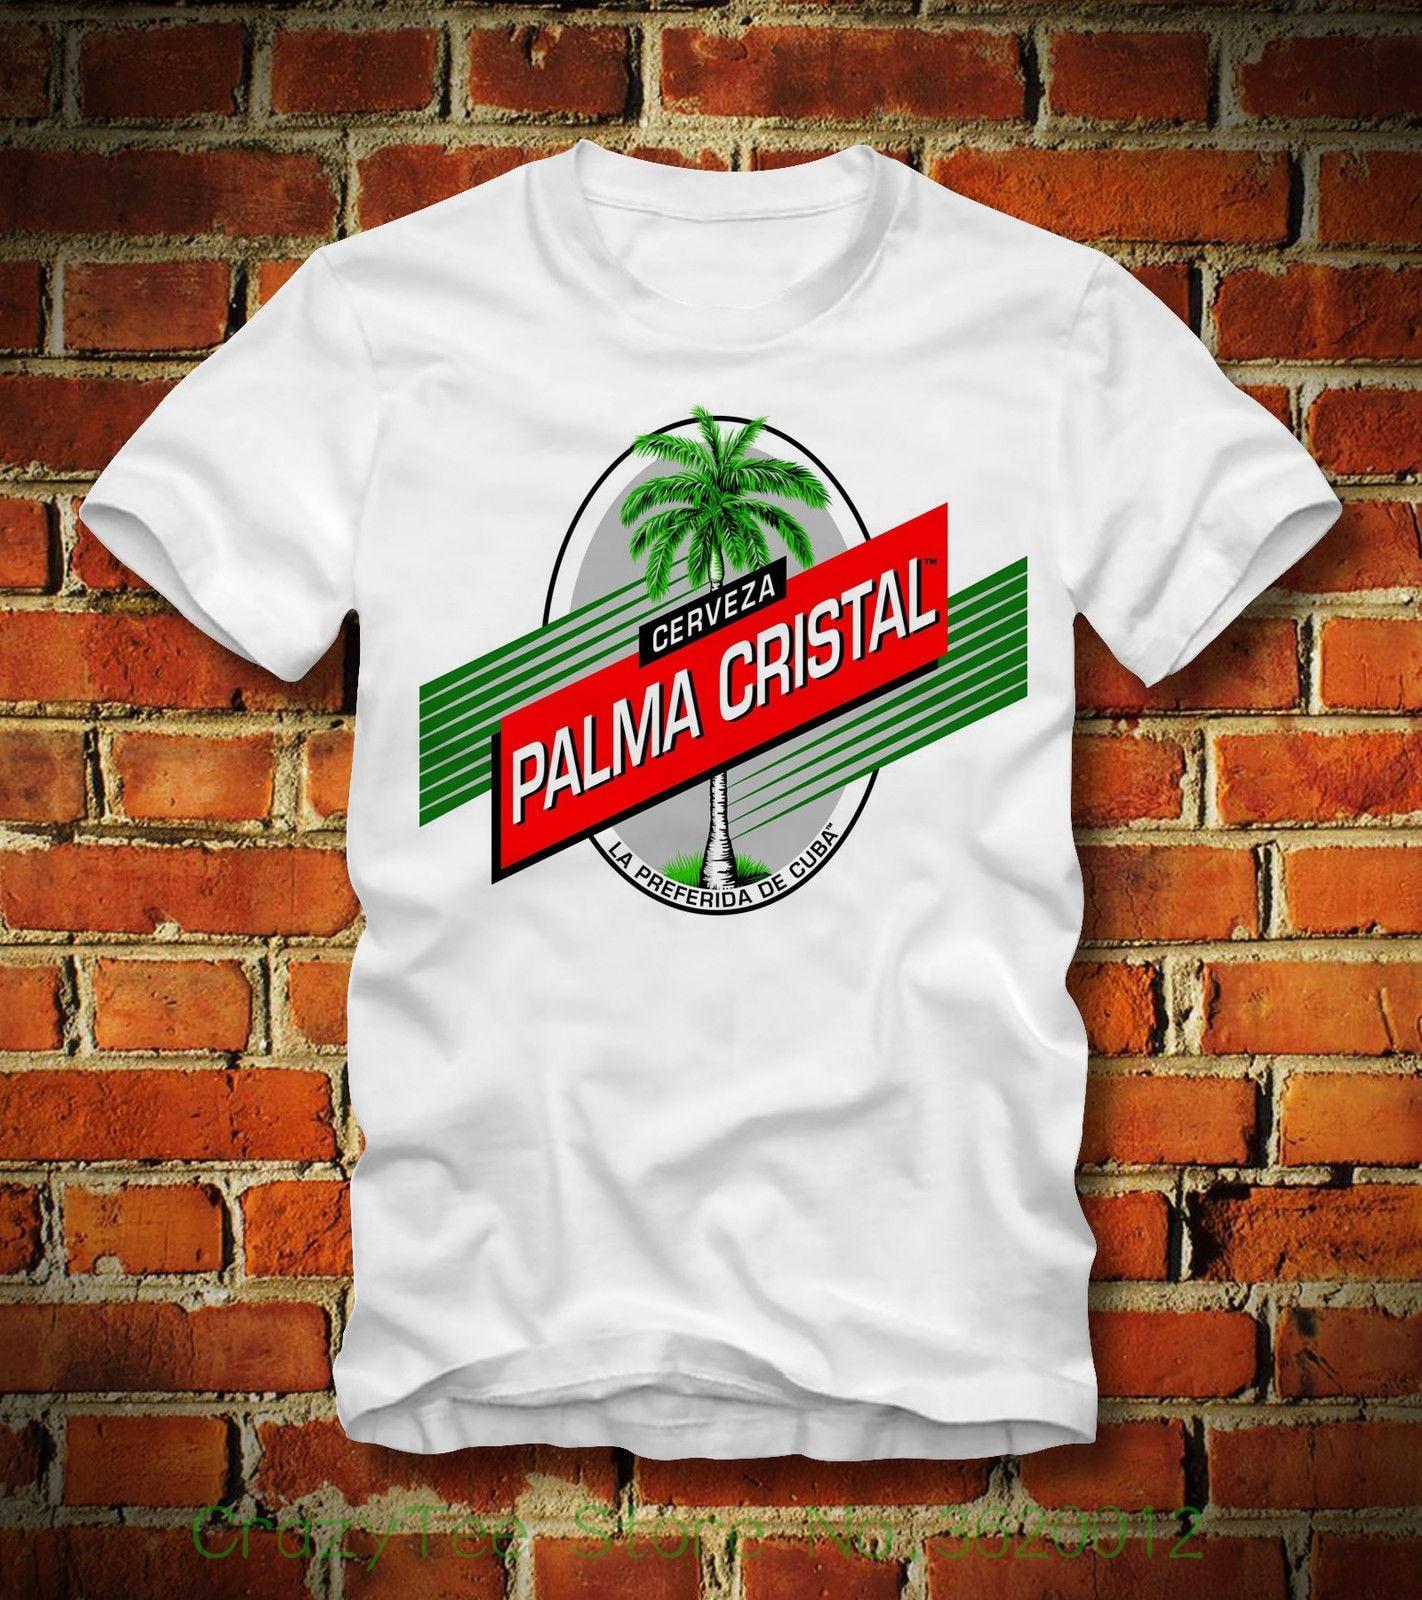 Camiseta para mujer, camiseta Palma cristalina, cerámica Kuba Cuba, Cerveza Bier Karibik Havanna, personaje de dibujos animados Hv